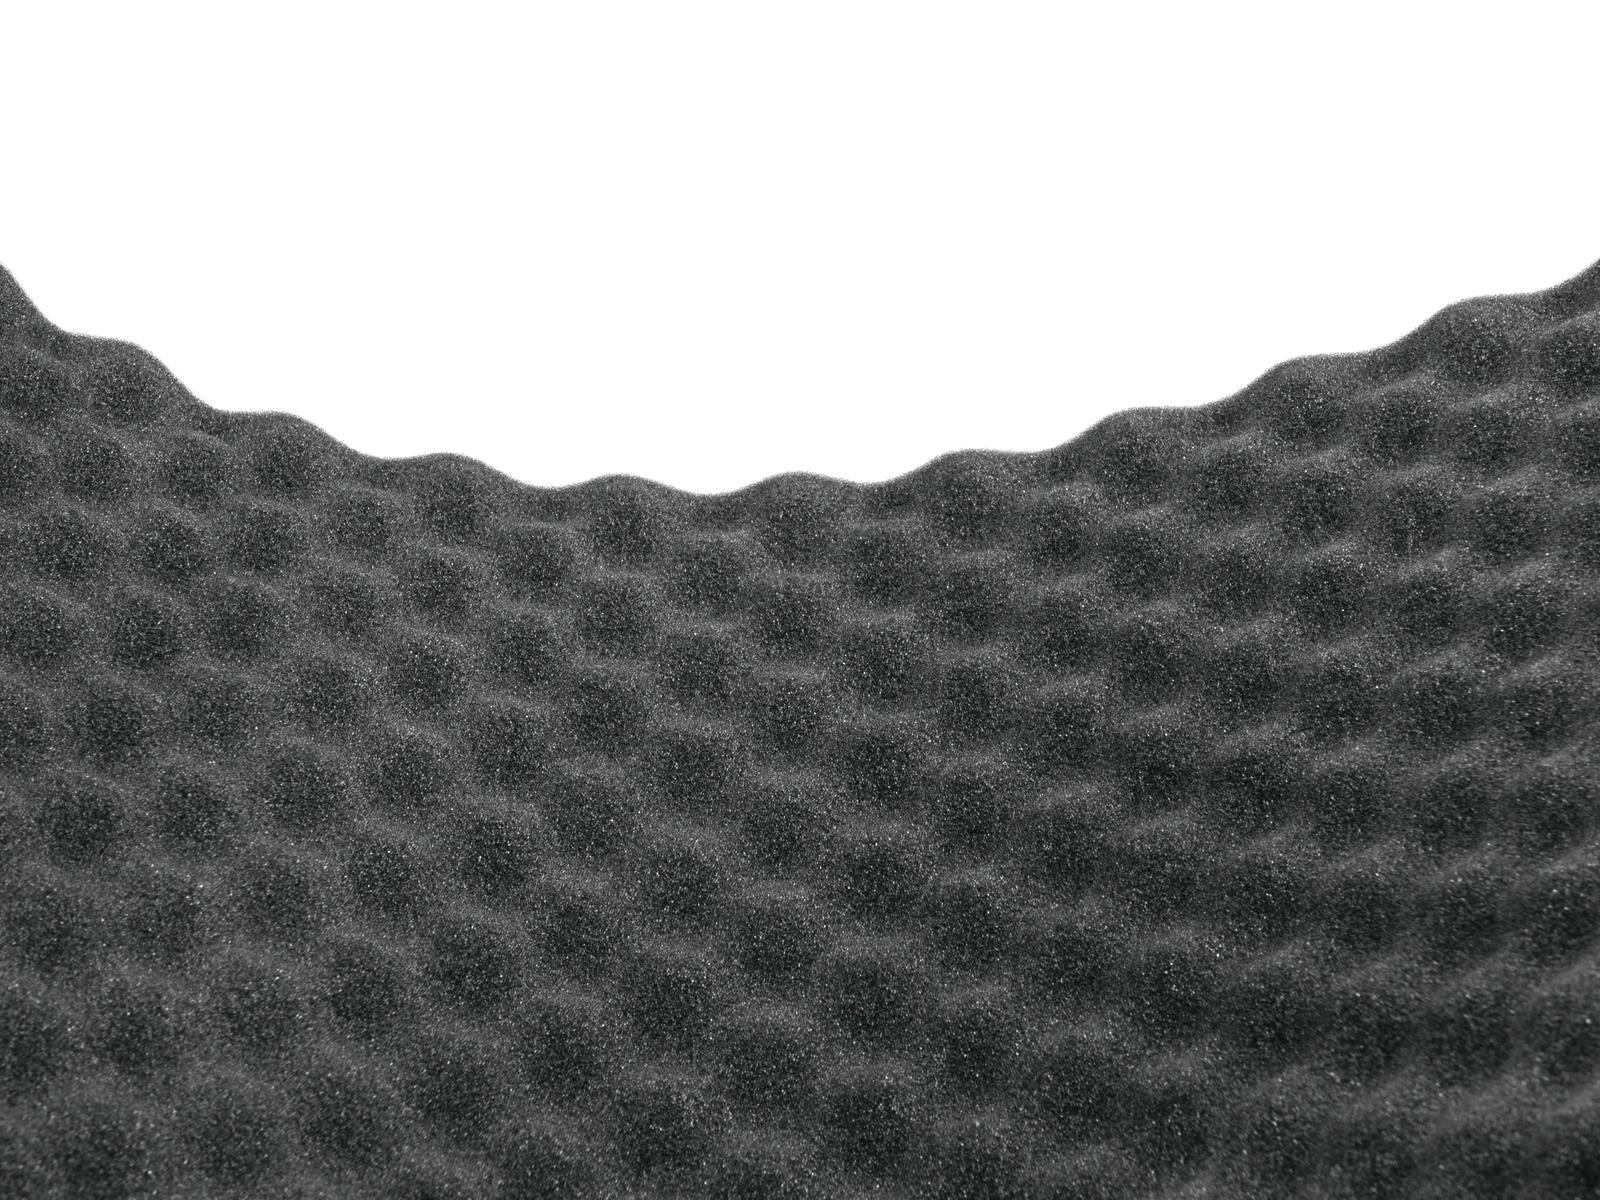 ACCESSORY Isoliermatte, Noppen Höhe 20mm, 100x206cm